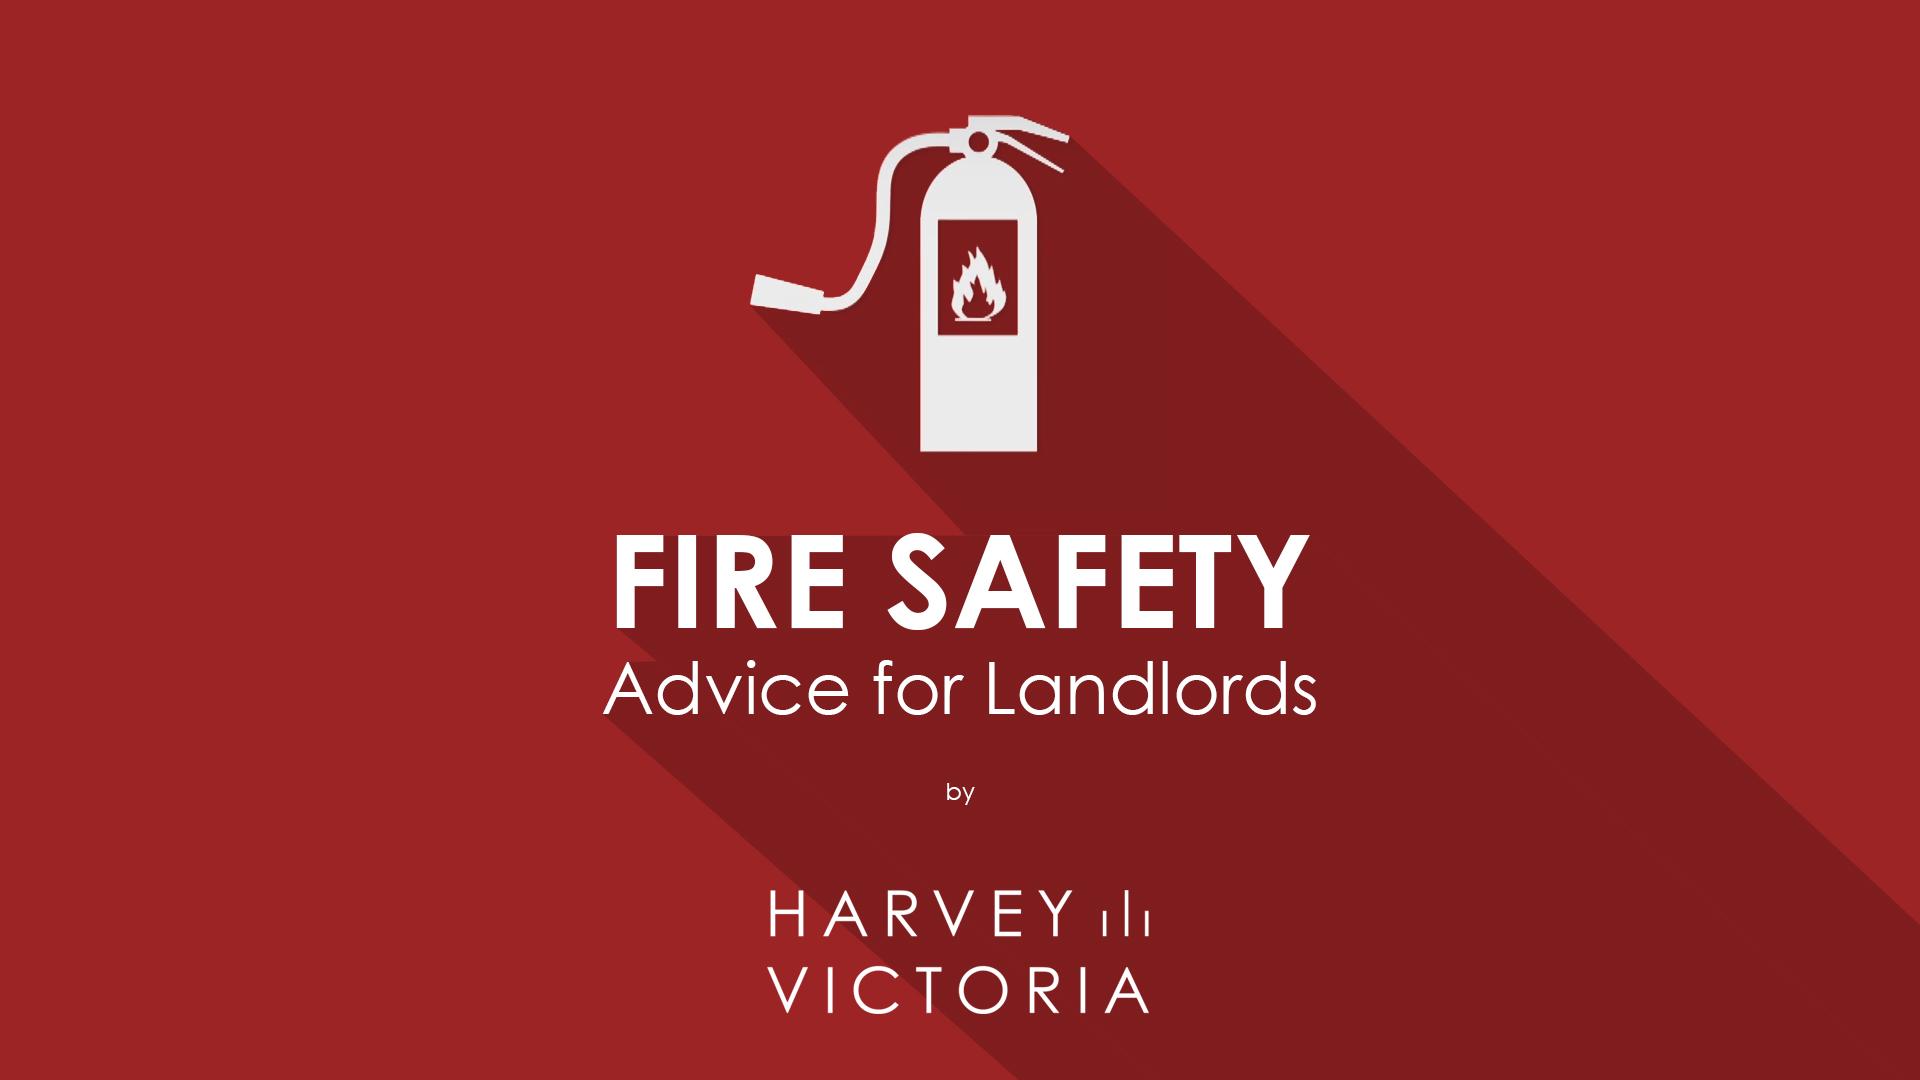 Fire-Safety-Landlords.jpg